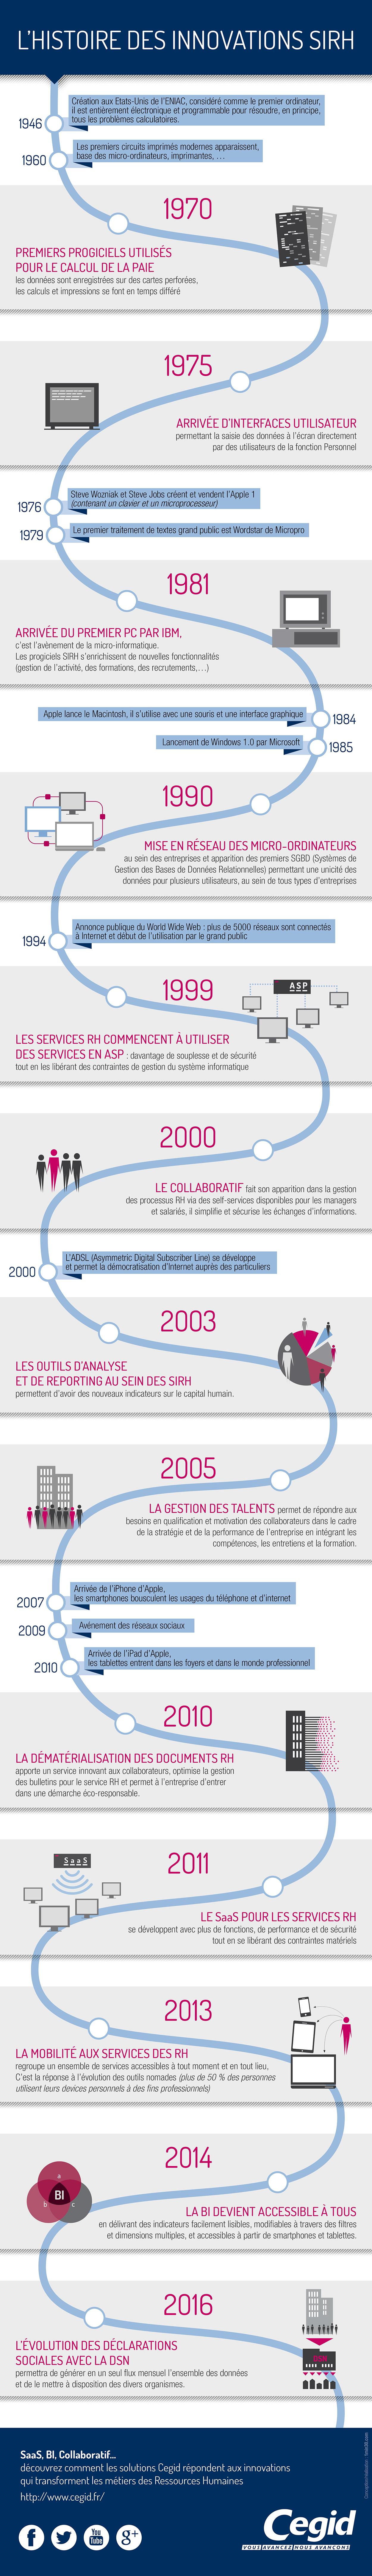 L'histoire des innovations SIRH, infographie par @CegidSIRH http://ow.ly/zDeJG